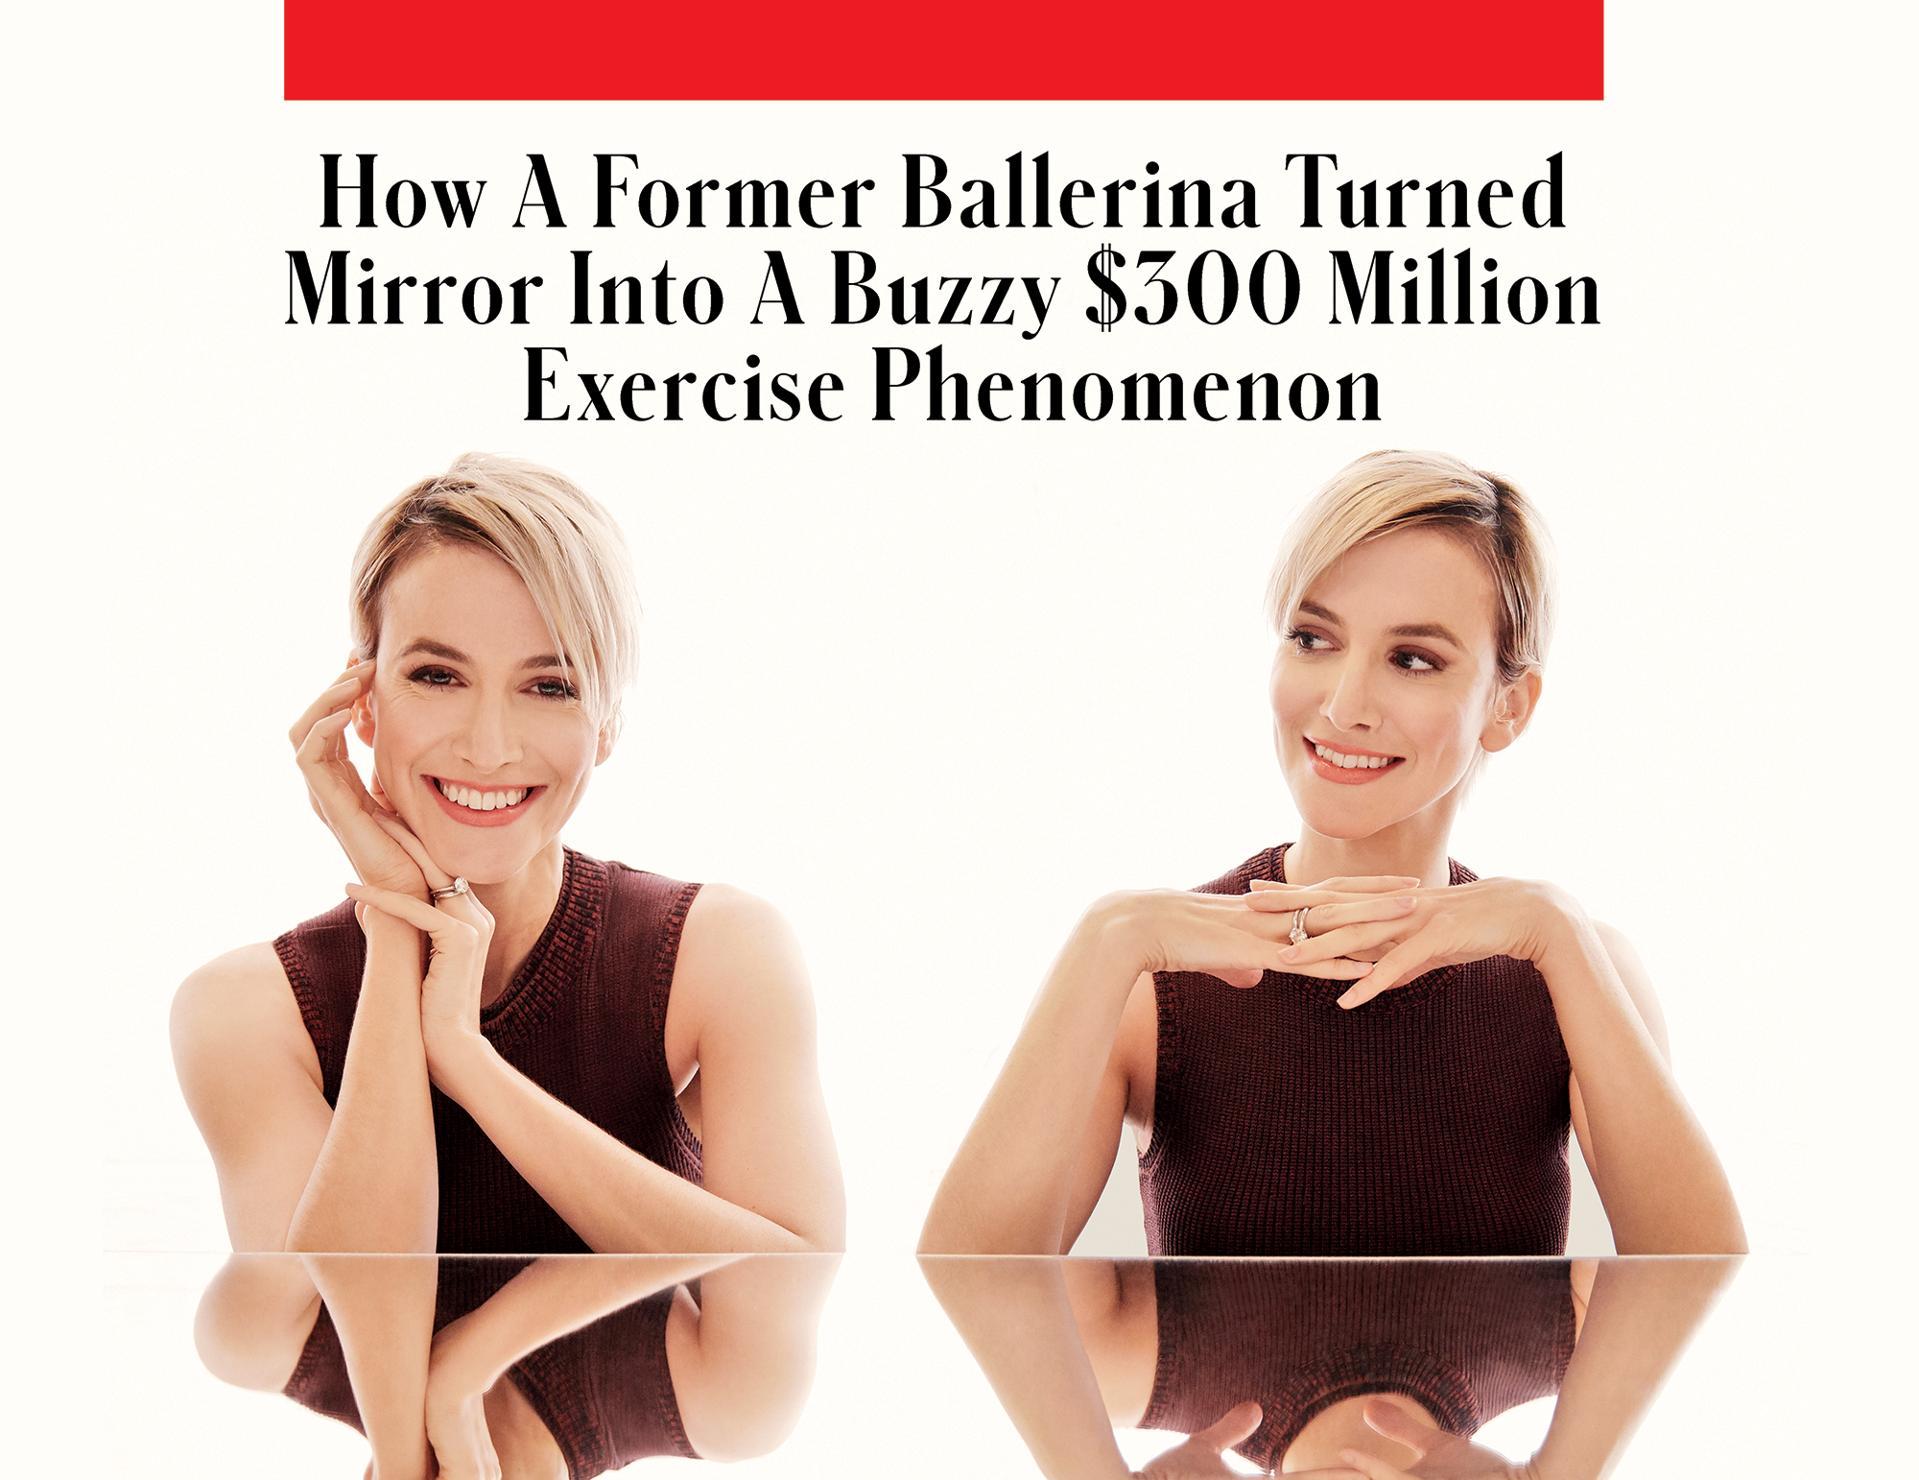 How A Former Ballerina Turned Mirror Into A Buzzy $300 Million Exercise Phenomenon